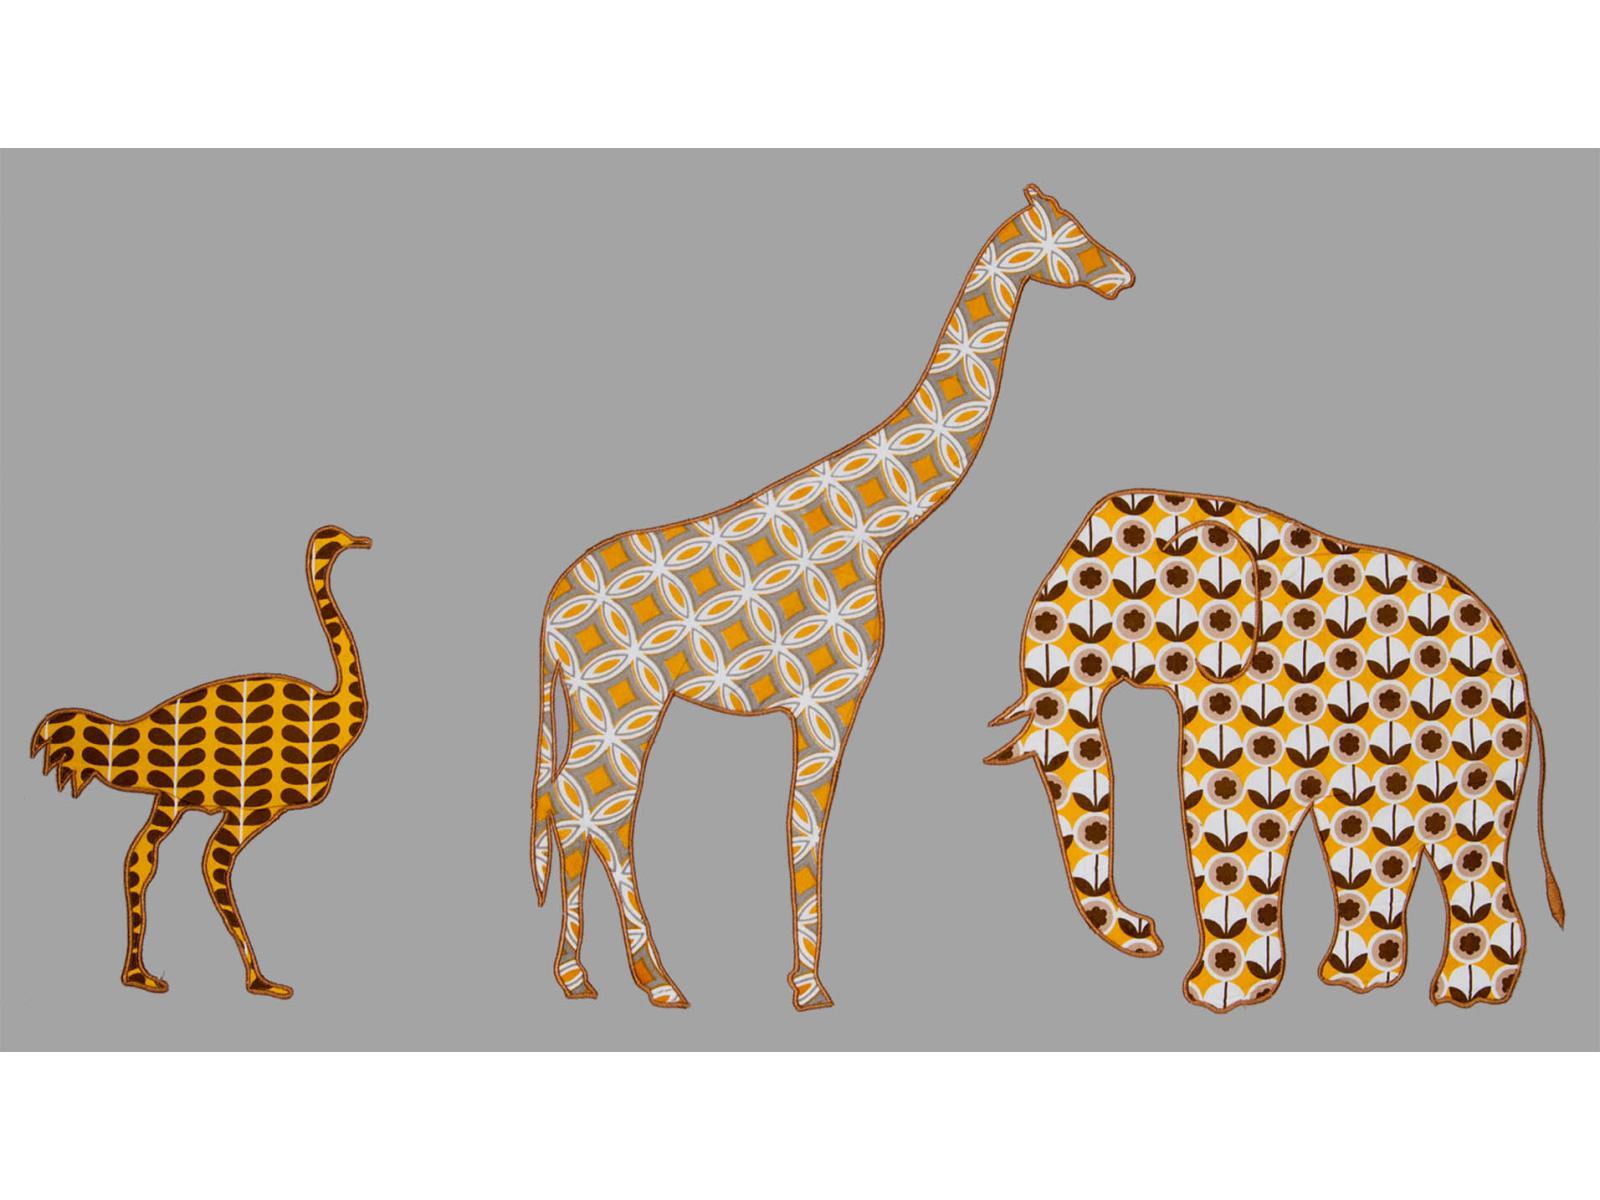 taftan housse de couette safari grey yellow brown 120 x 150. Black Bedroom Furniture Sets. Home Design Ideas